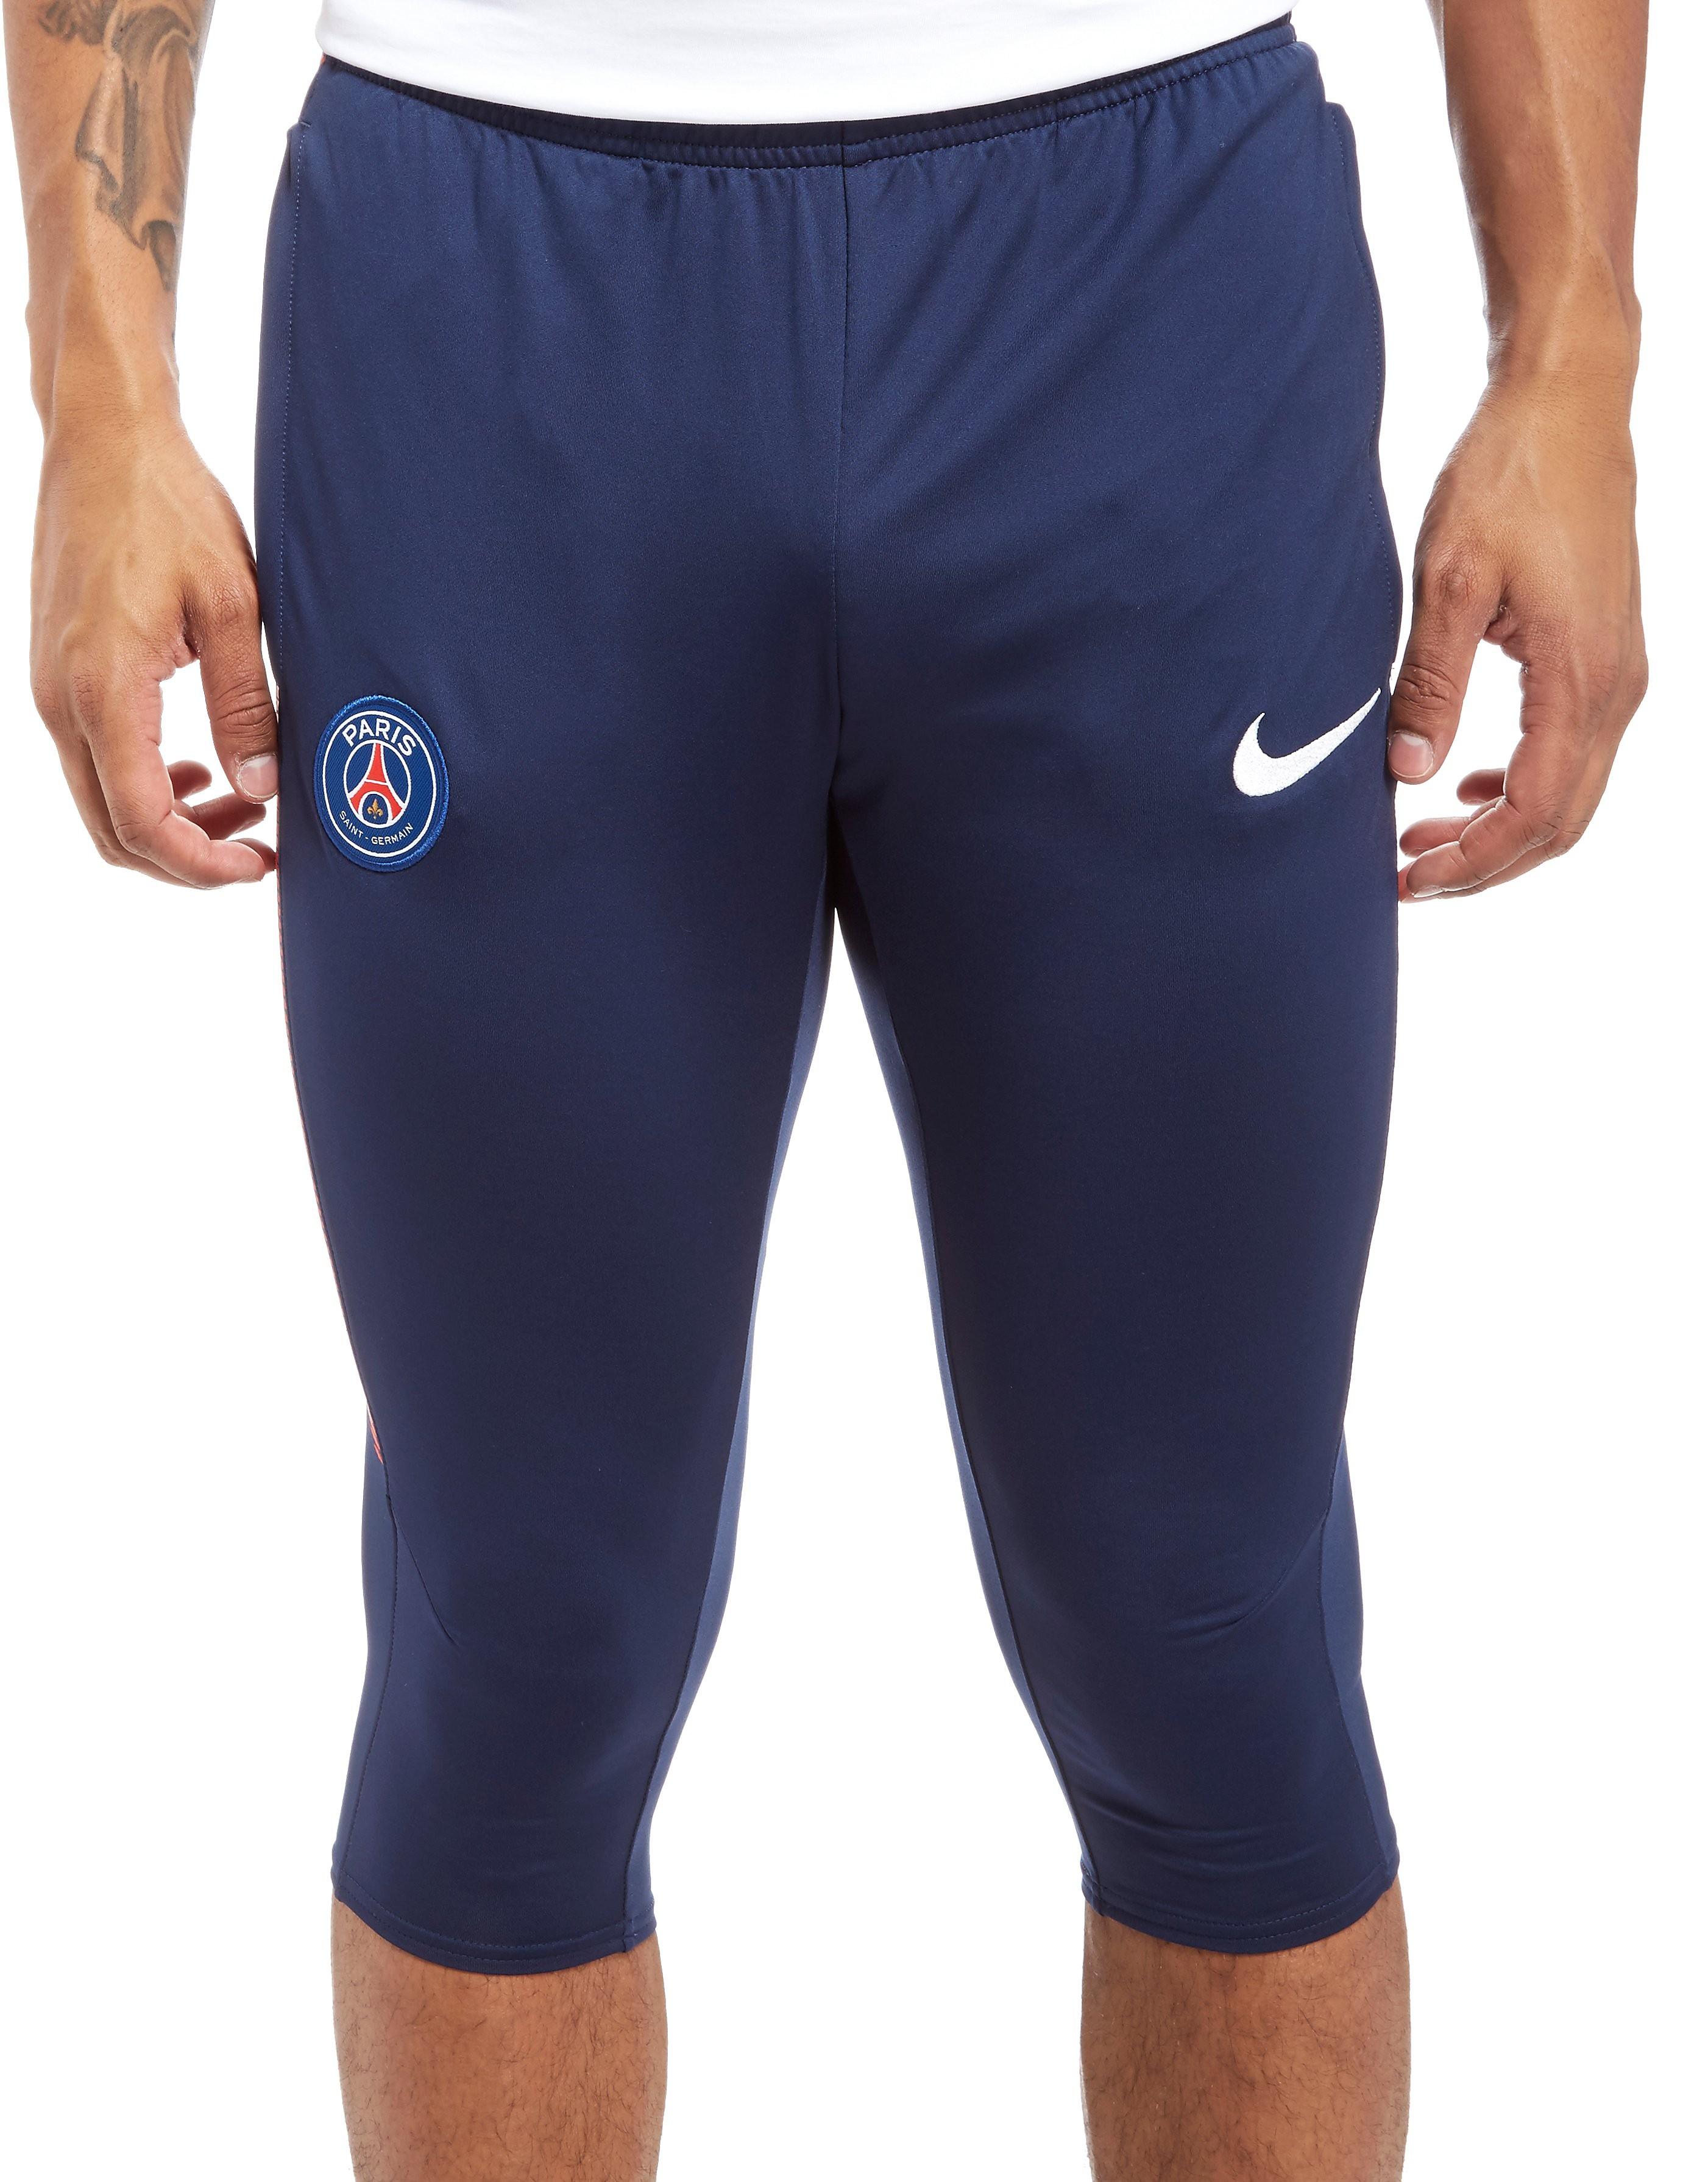 Nike Paris Saint-Germain 2017/18 Pantaloni 3/4 Squadra